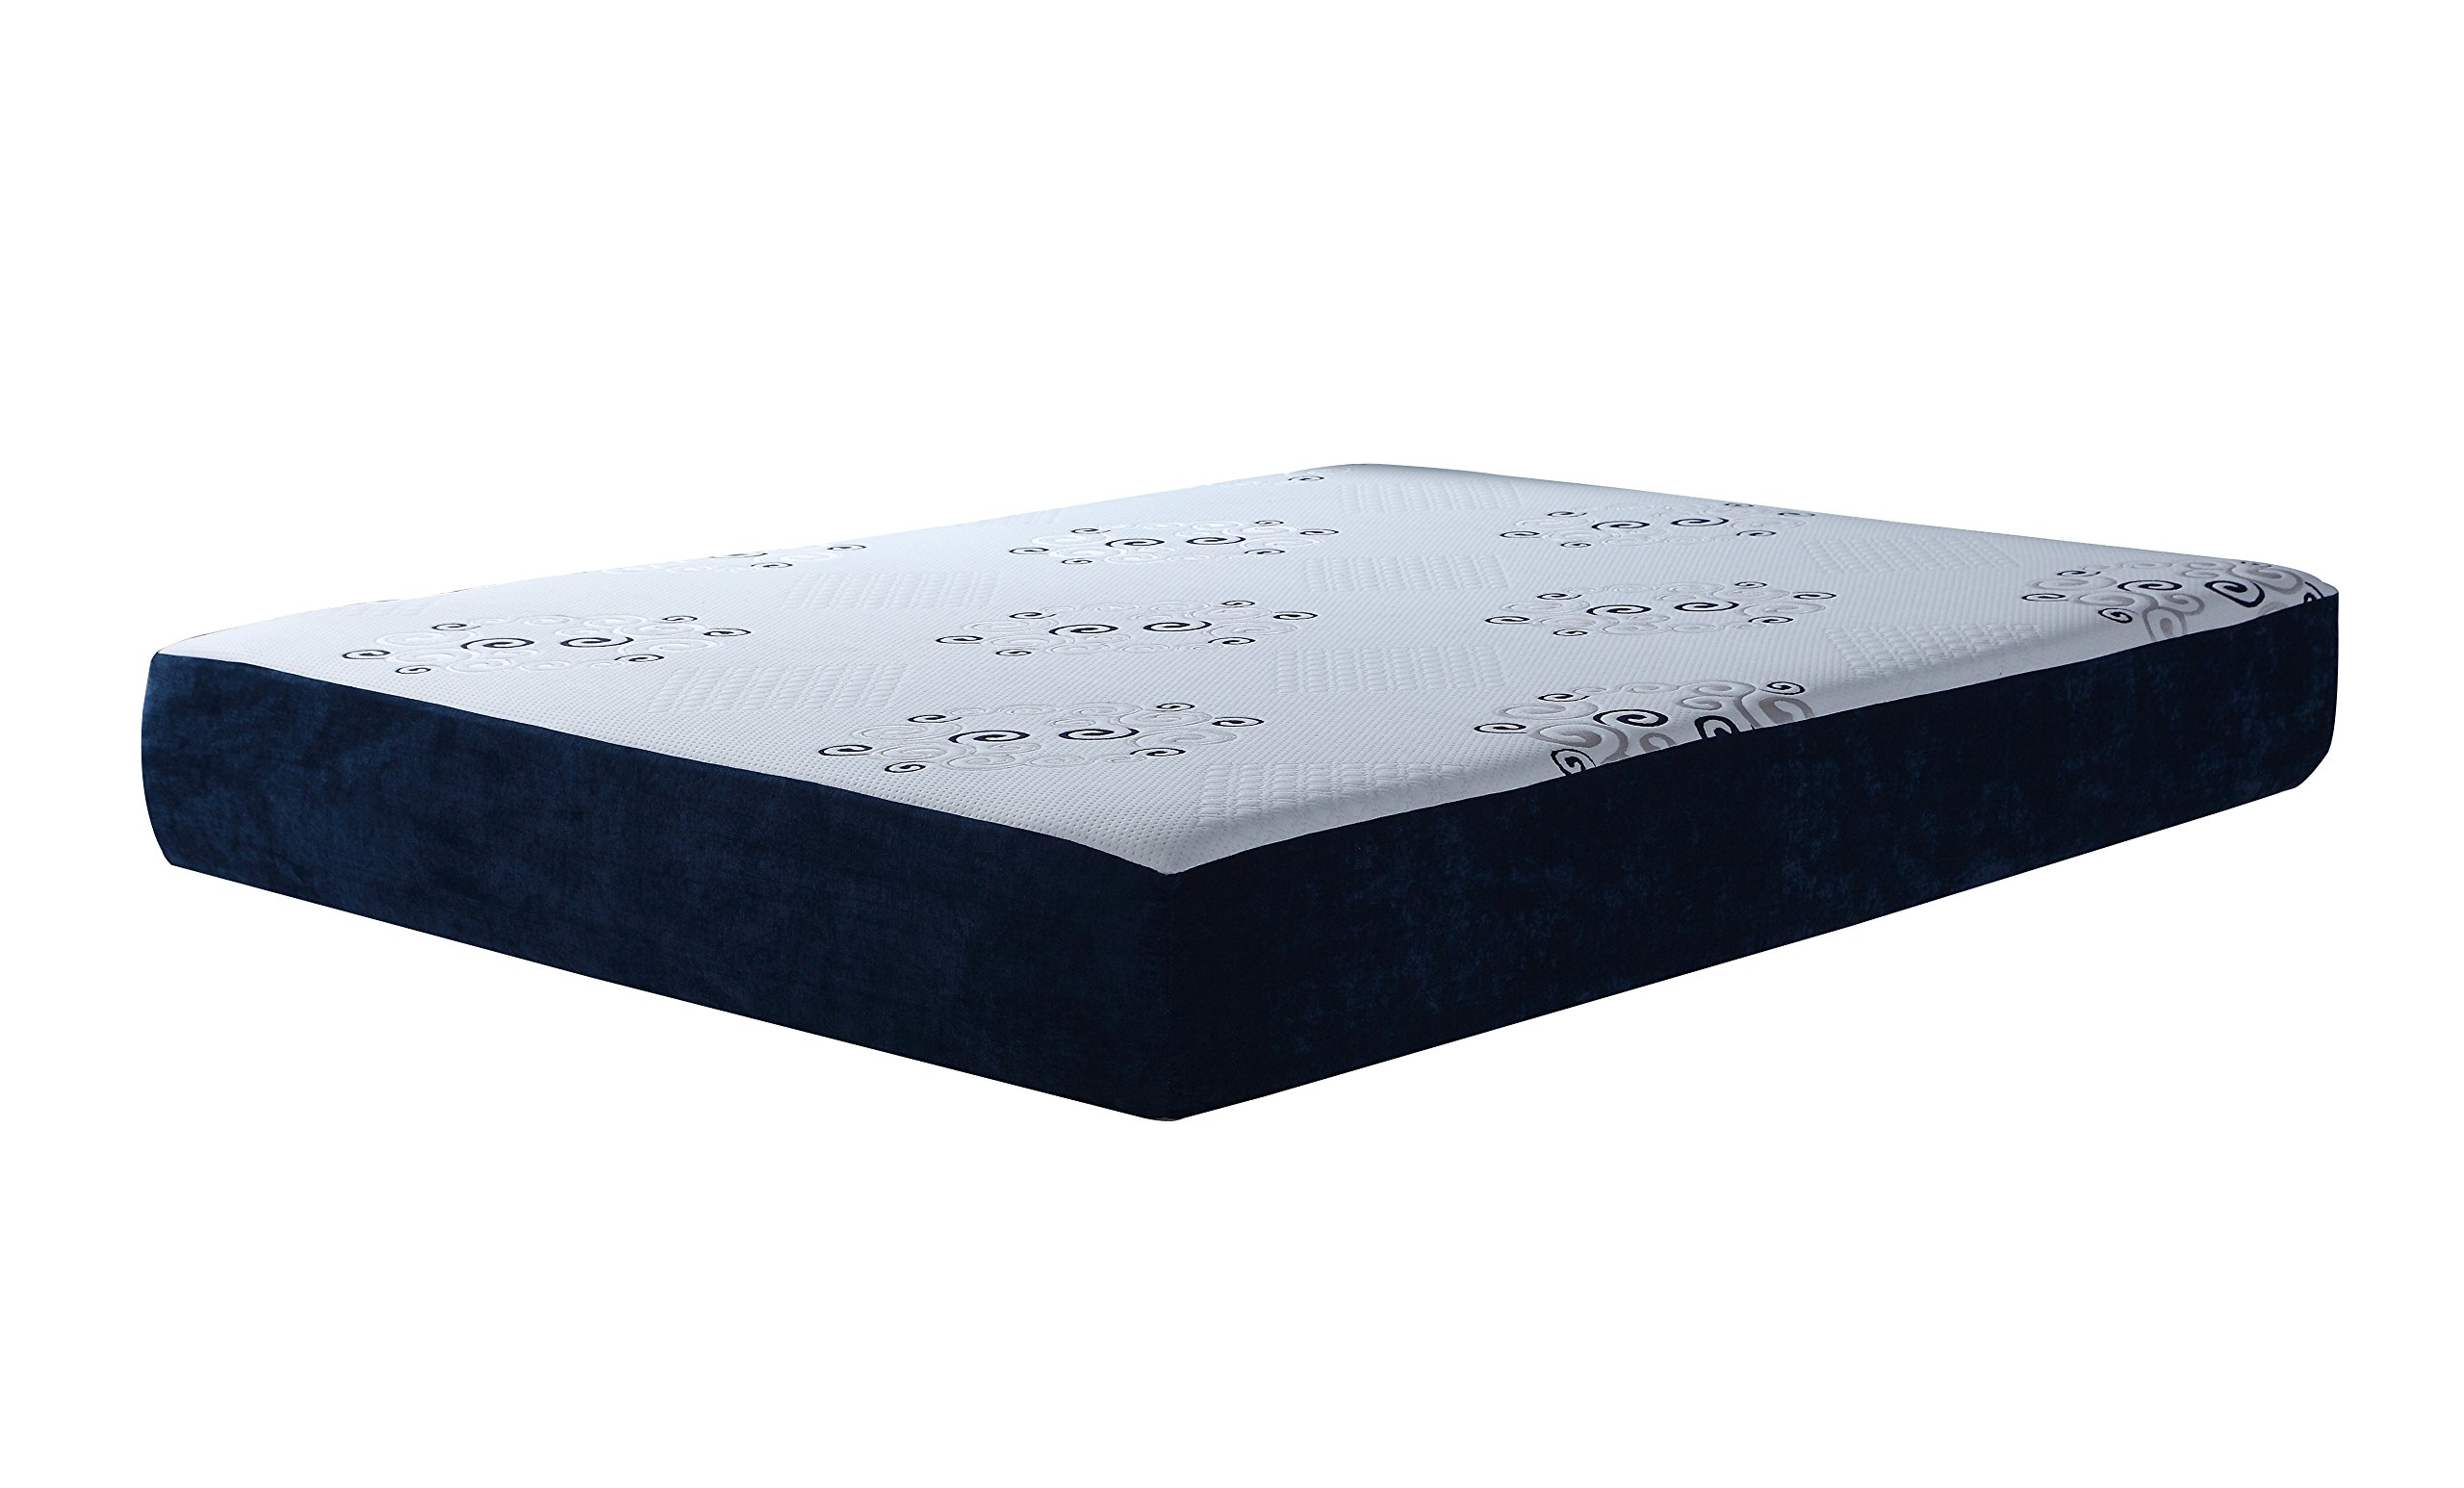 Swiss Ortho Sleep, 10'' High-Density, 3 x Layered reversible LATEX & MEMORY FOAM MATTRESS, w/ Bamboo Cover, All Sizes (Twin)